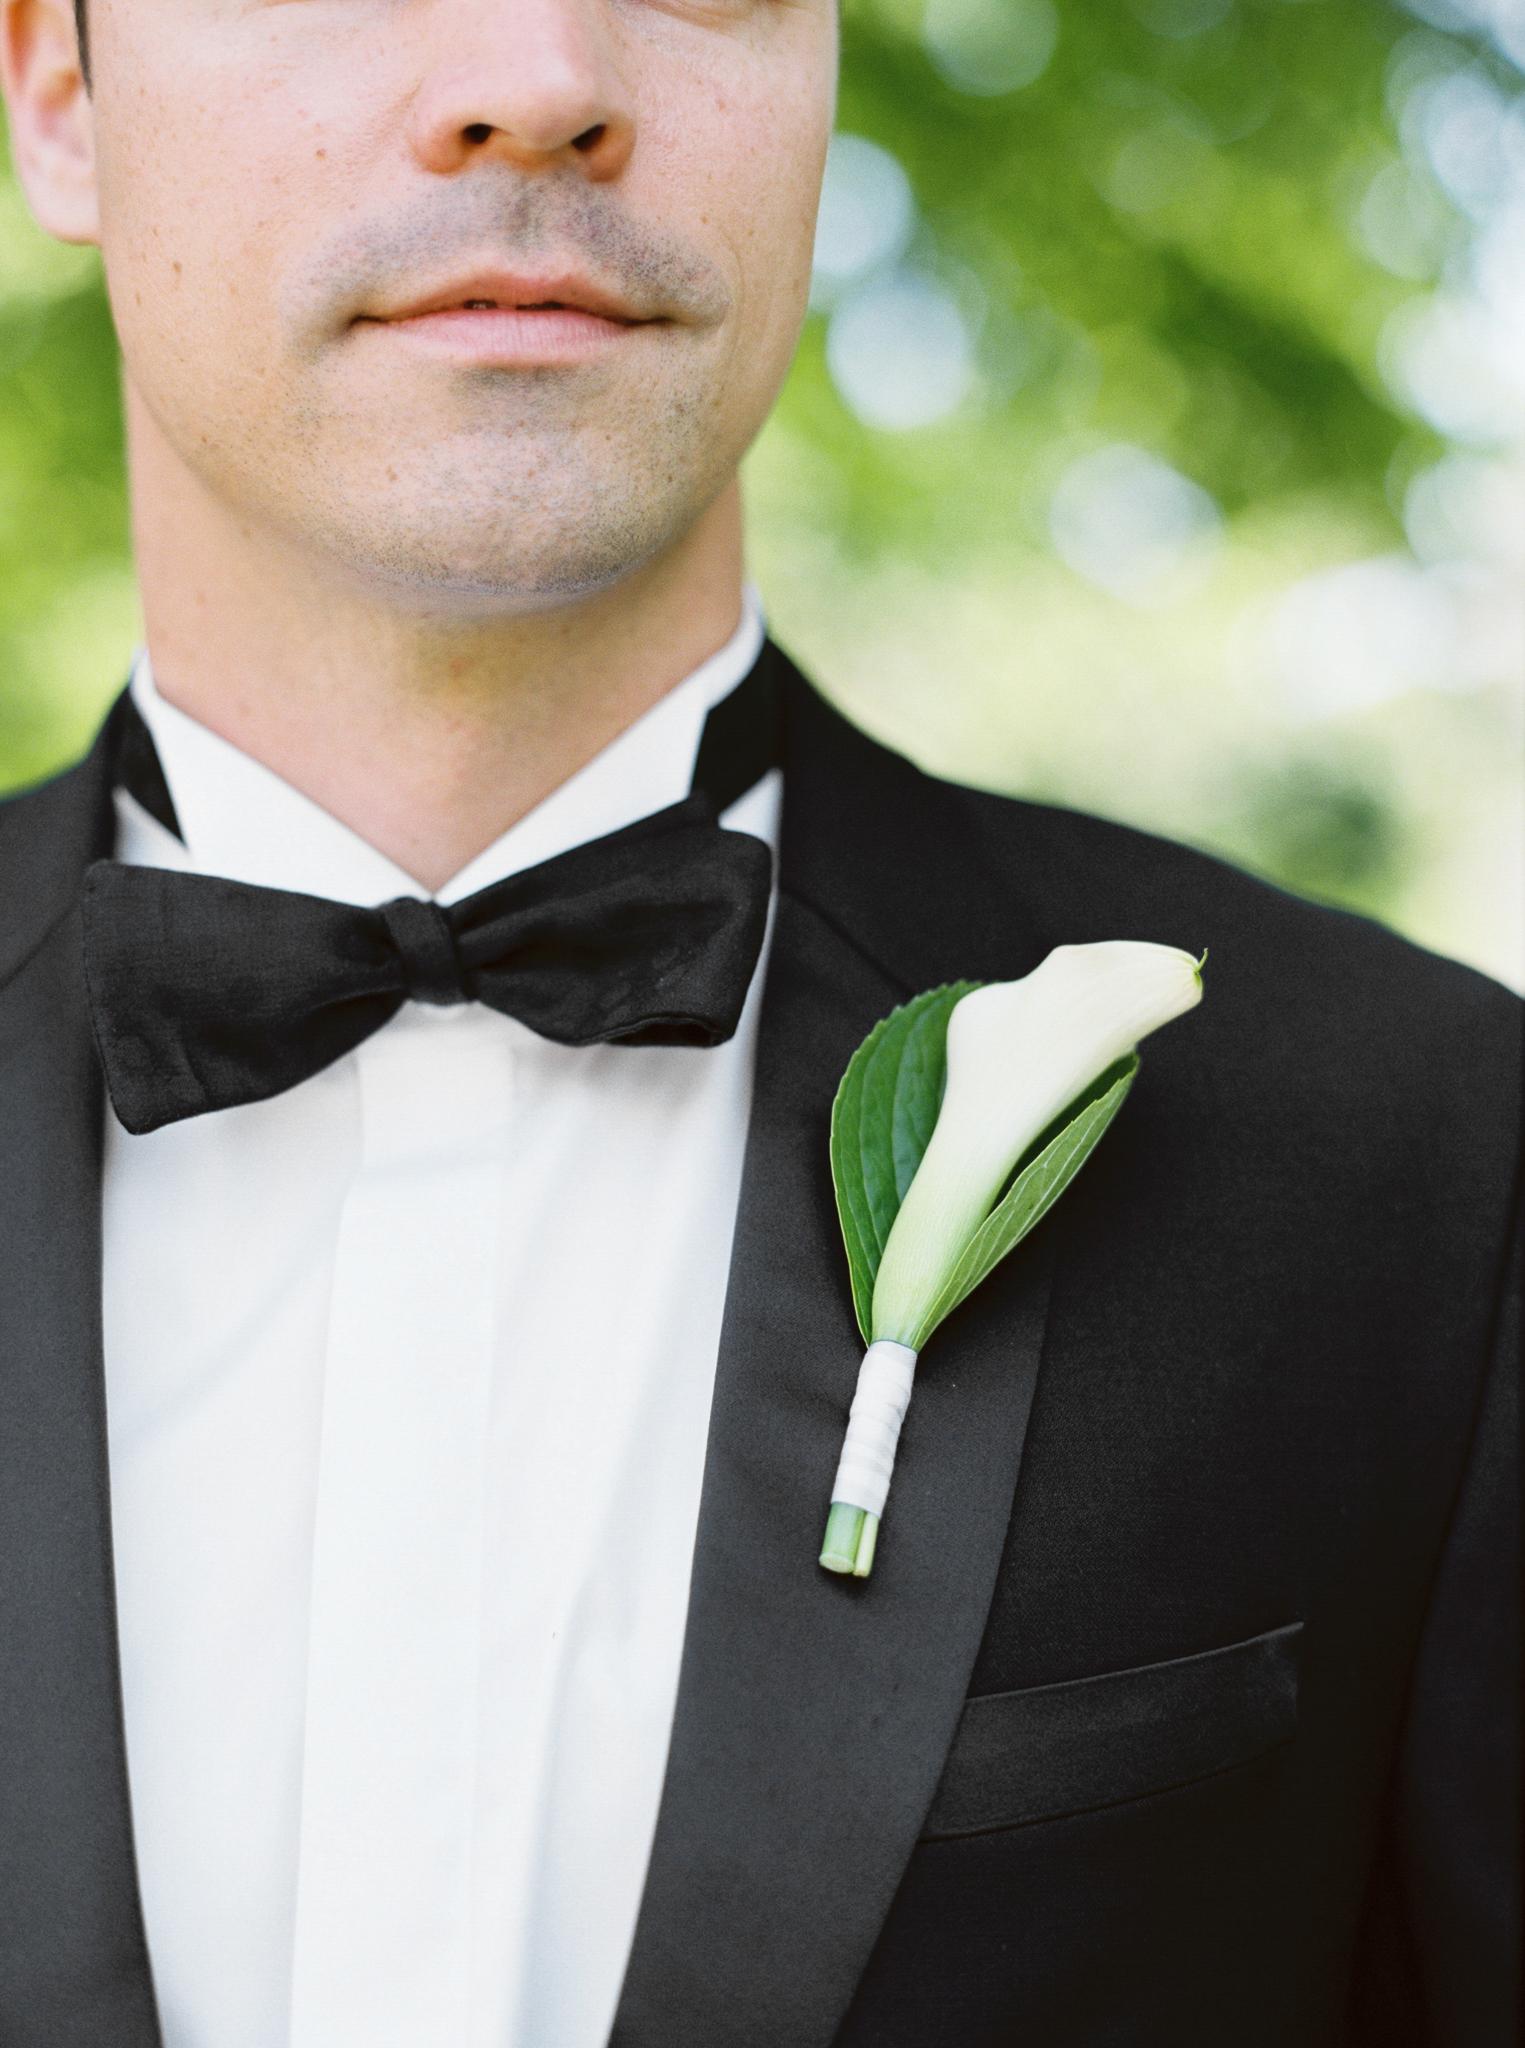 058OutliveCreative_Travel_Photographer_Videographer_Lewis&Clark_Oregon_Elegant_BlackTie_Destination_Wedding.jpg